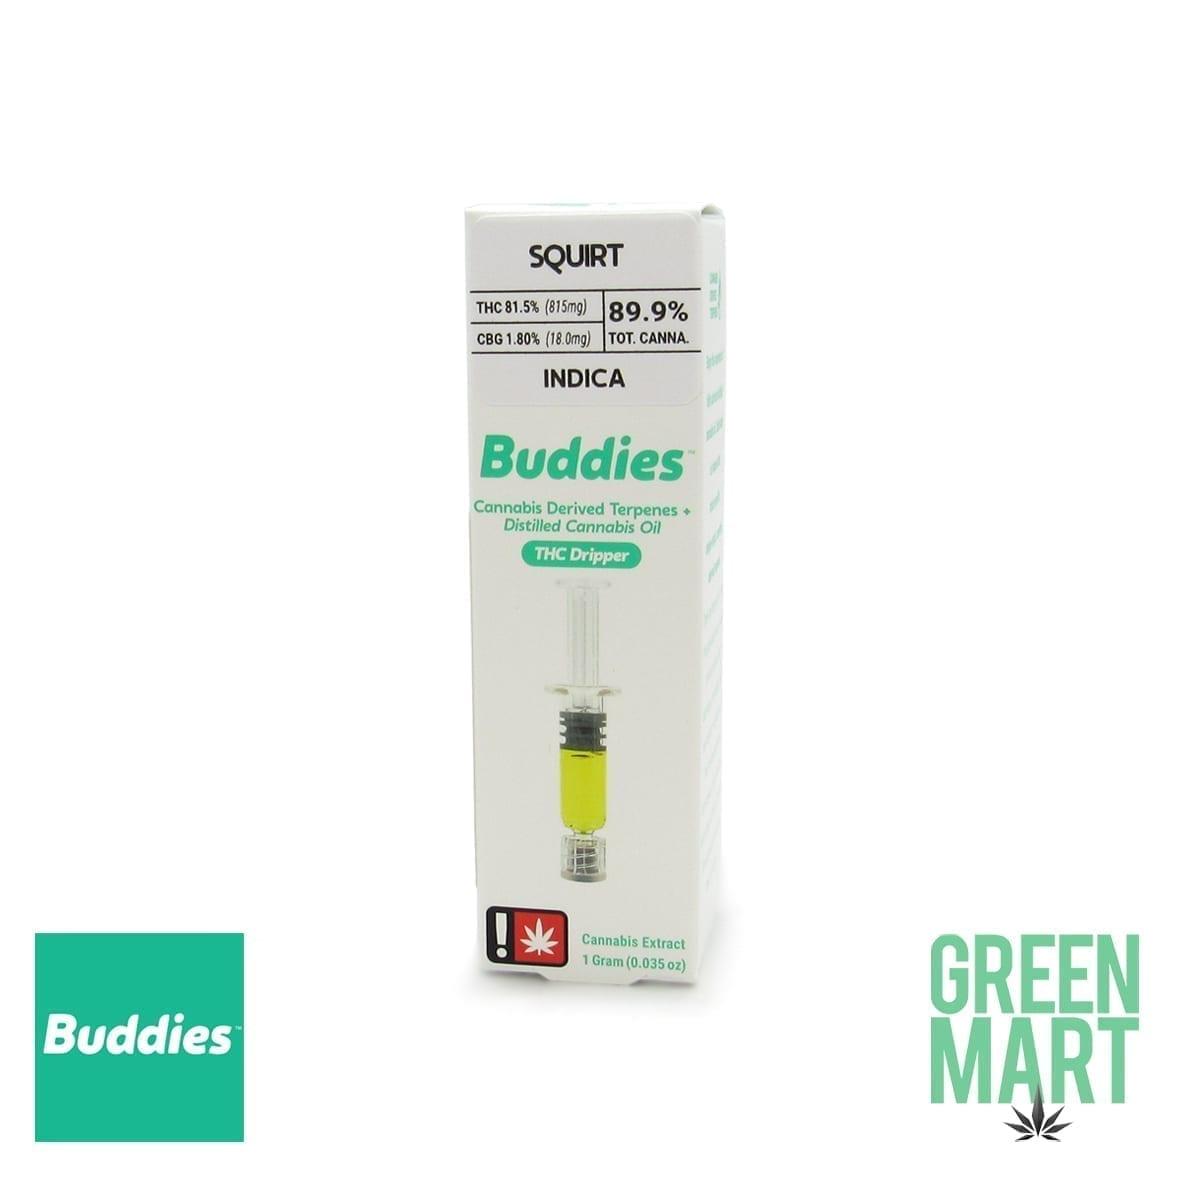 Buddies Brand THC Dripper - Squirt